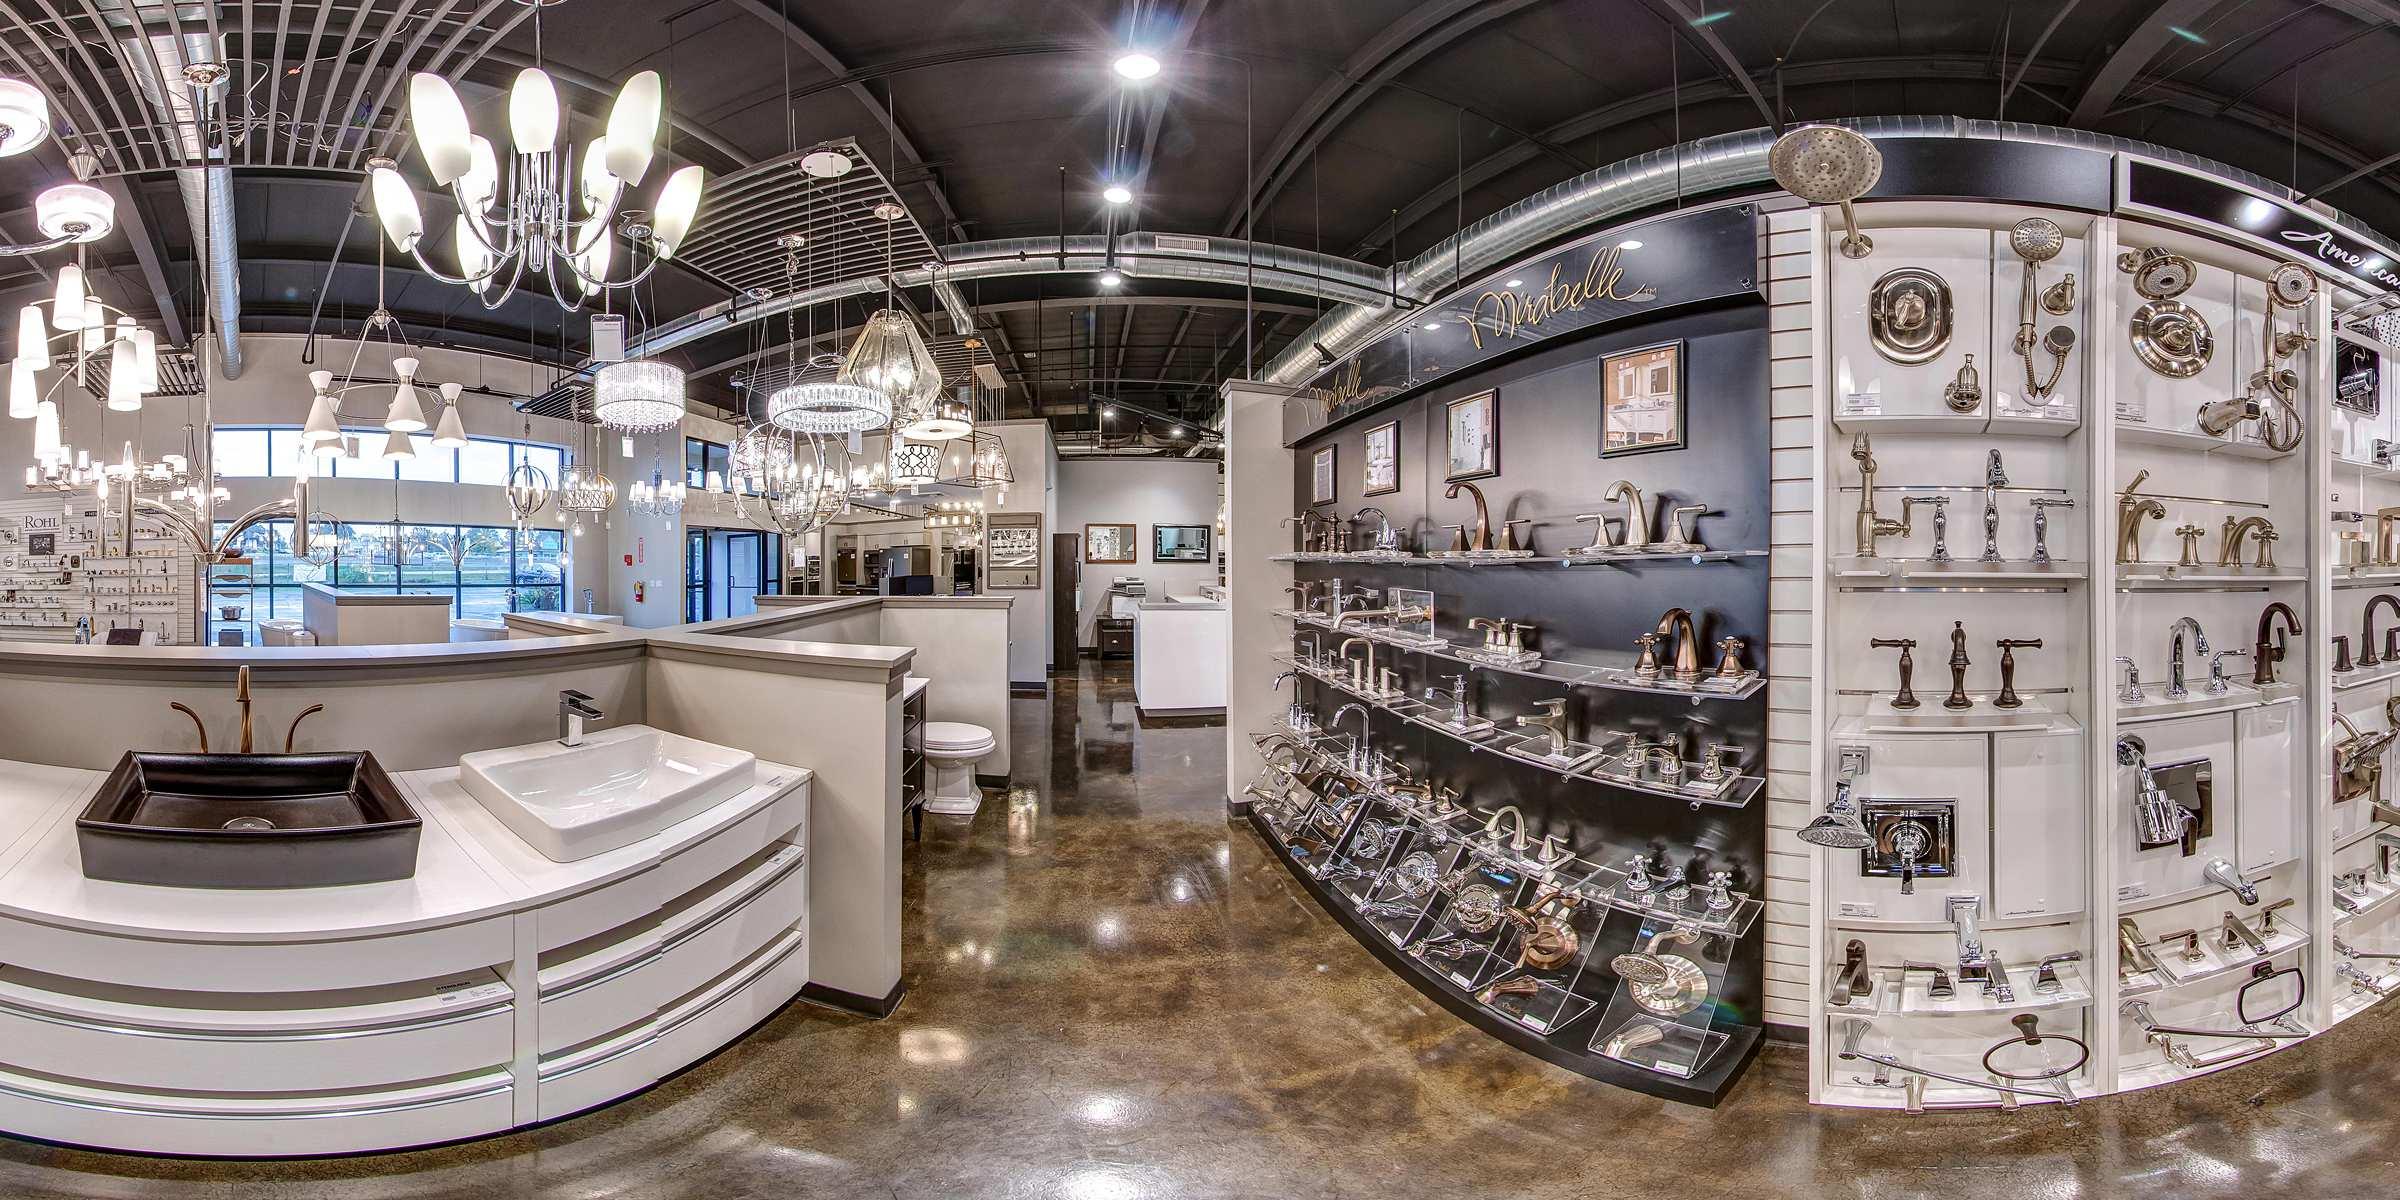 Ferguson Kitchen Bath Lighting Gallery - Democraciaejustica